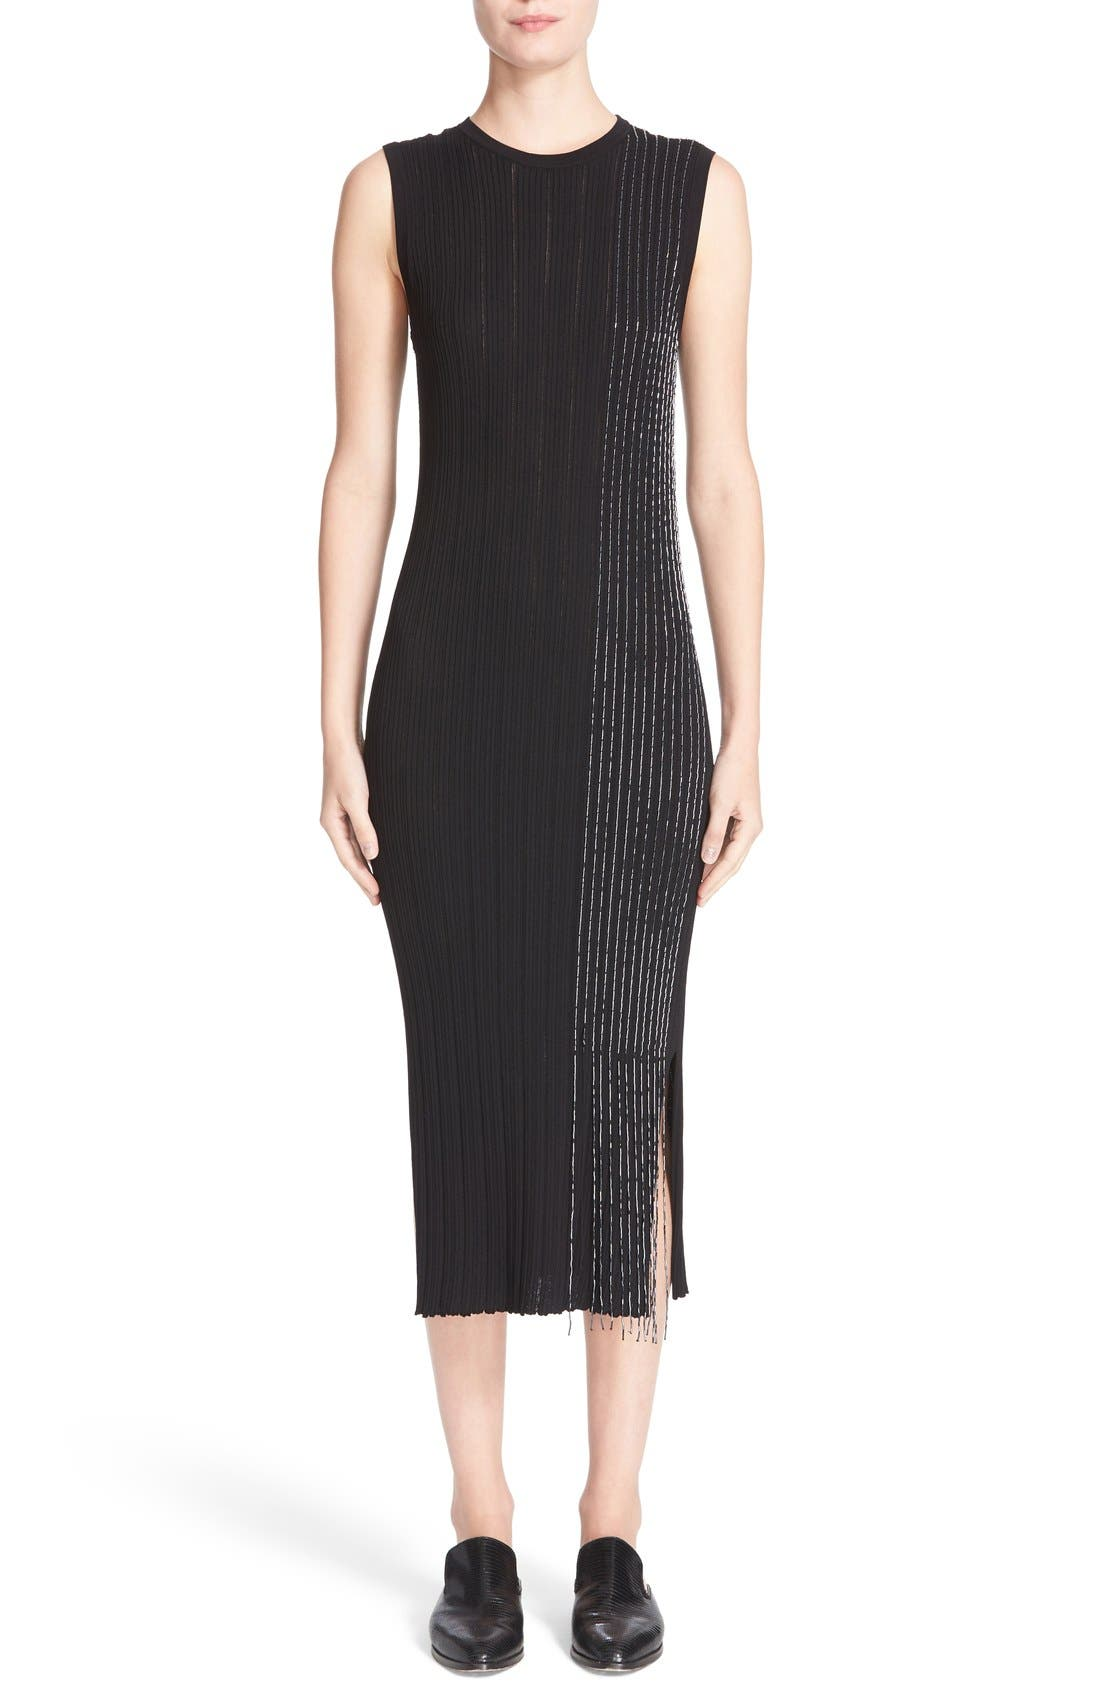 GREY JASON WU Beaded Knit Midi Dress